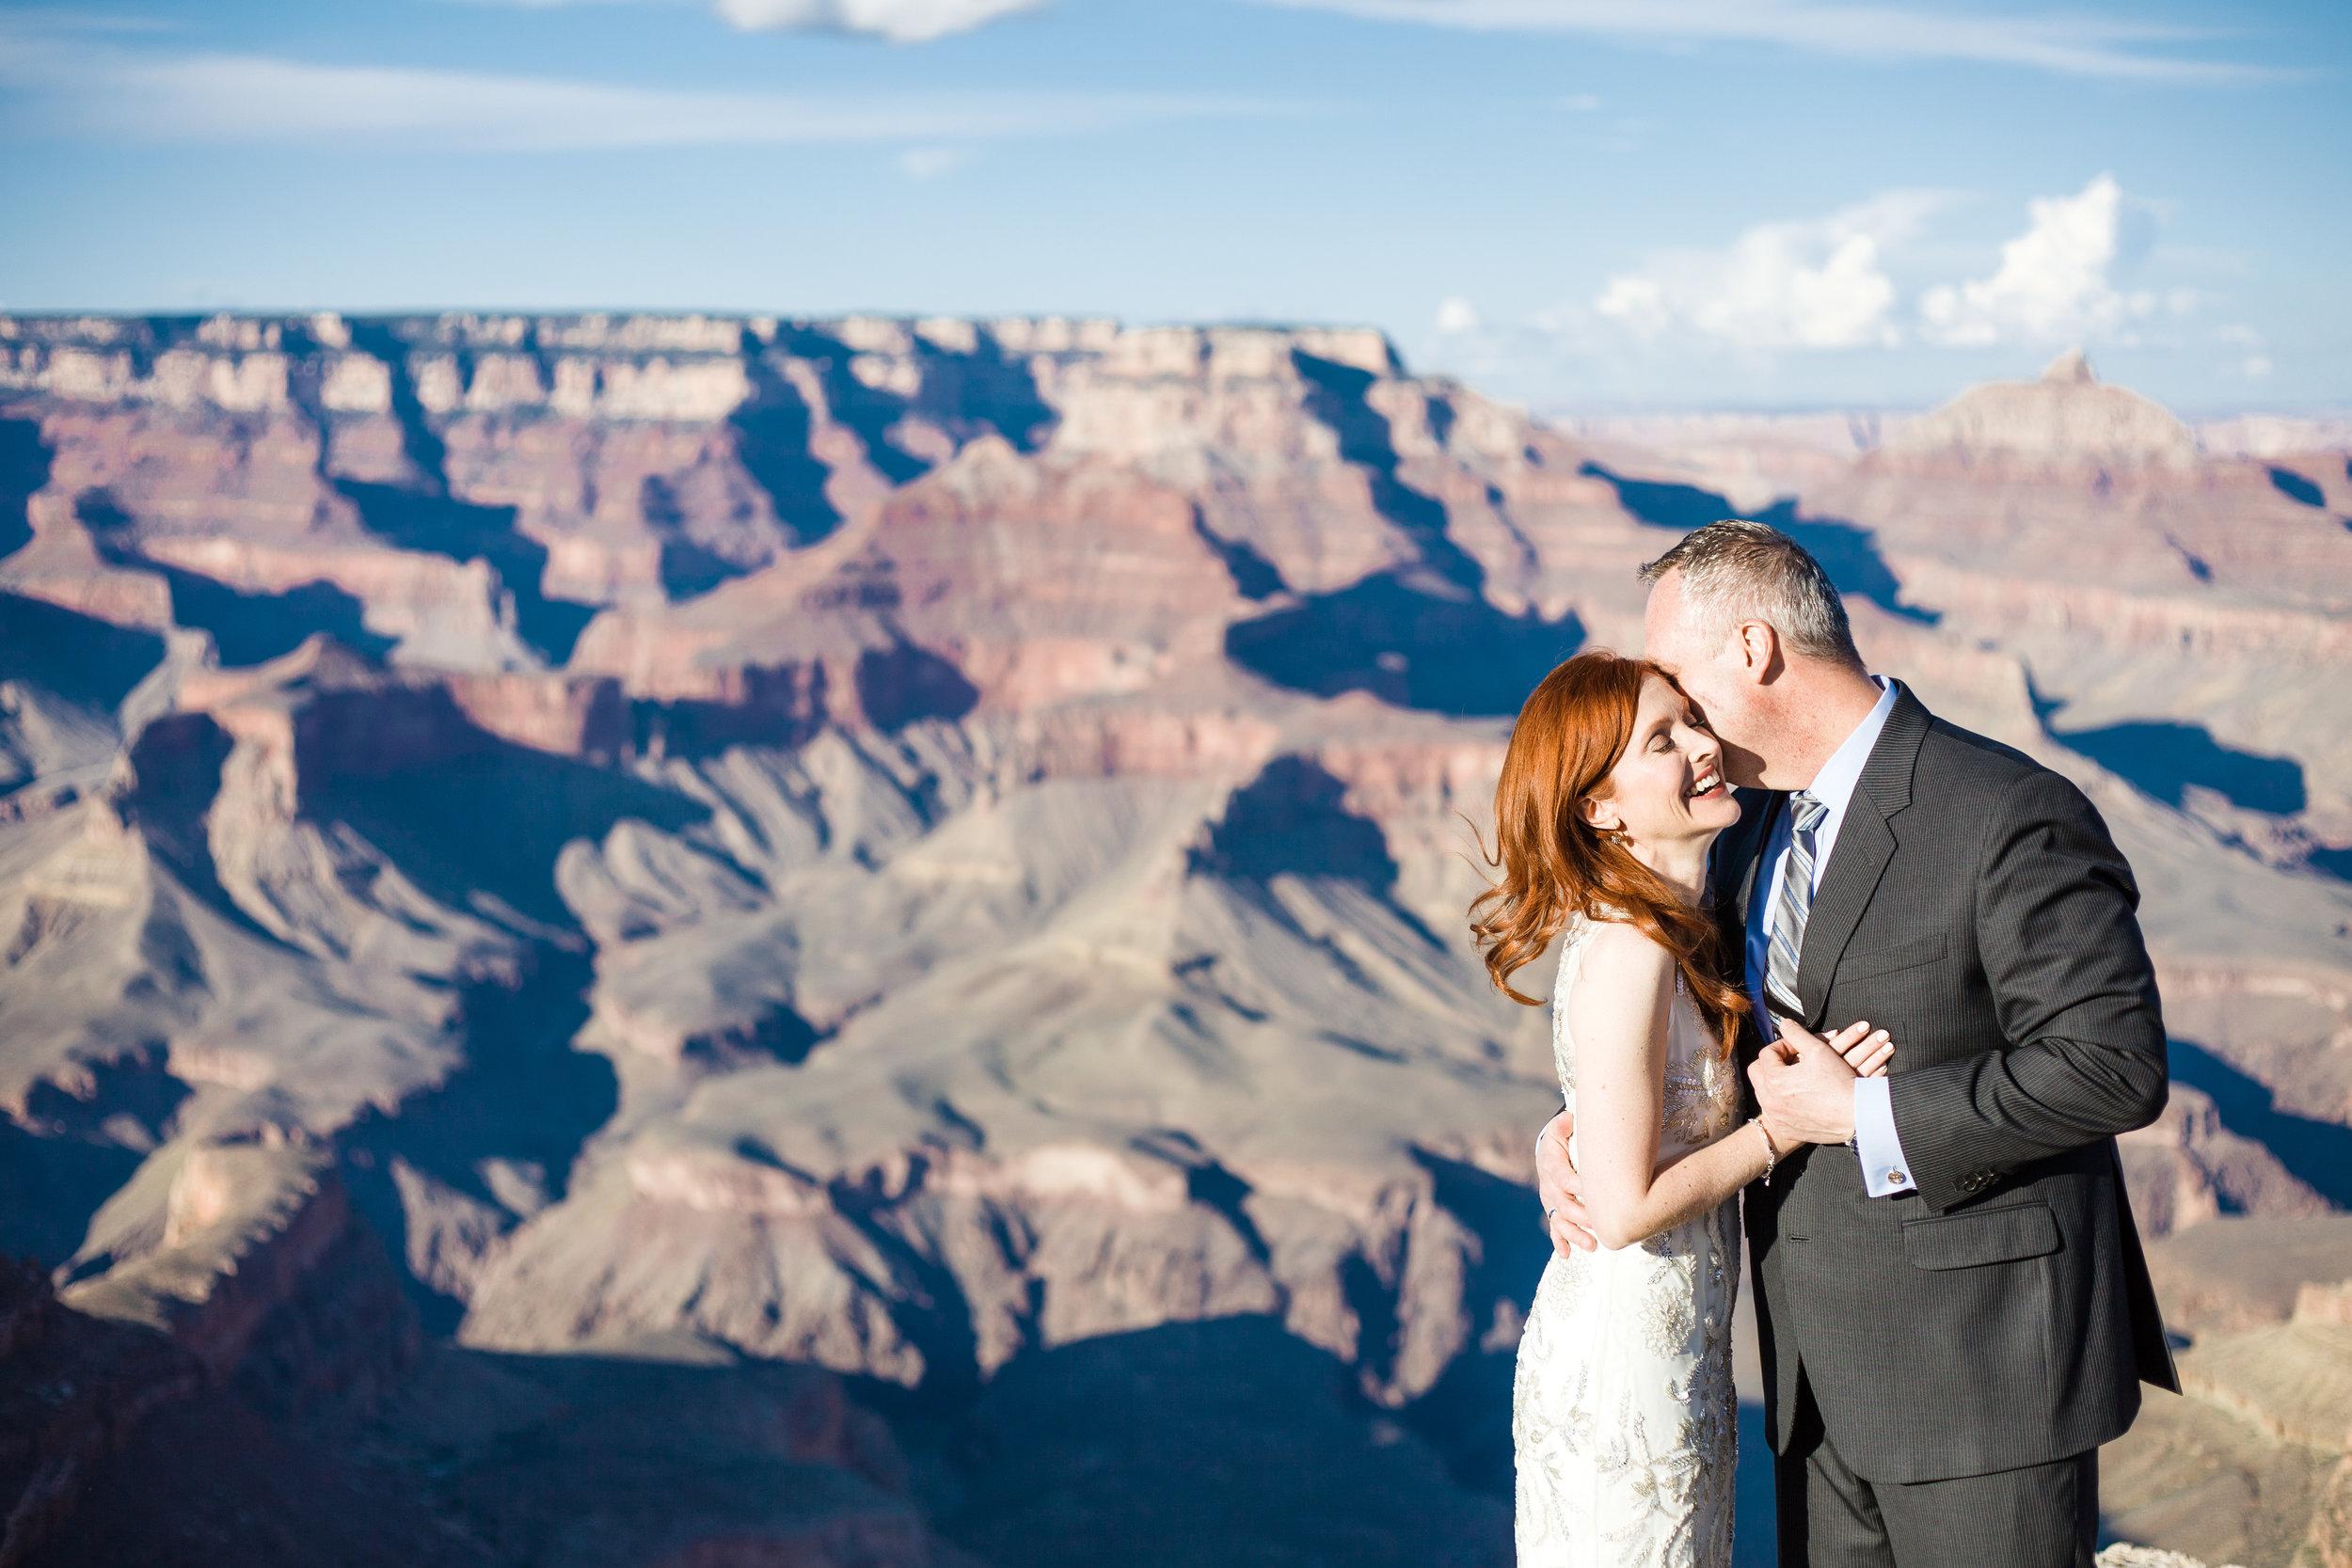 Grand Canyon wedding photographer, Shoshone Point